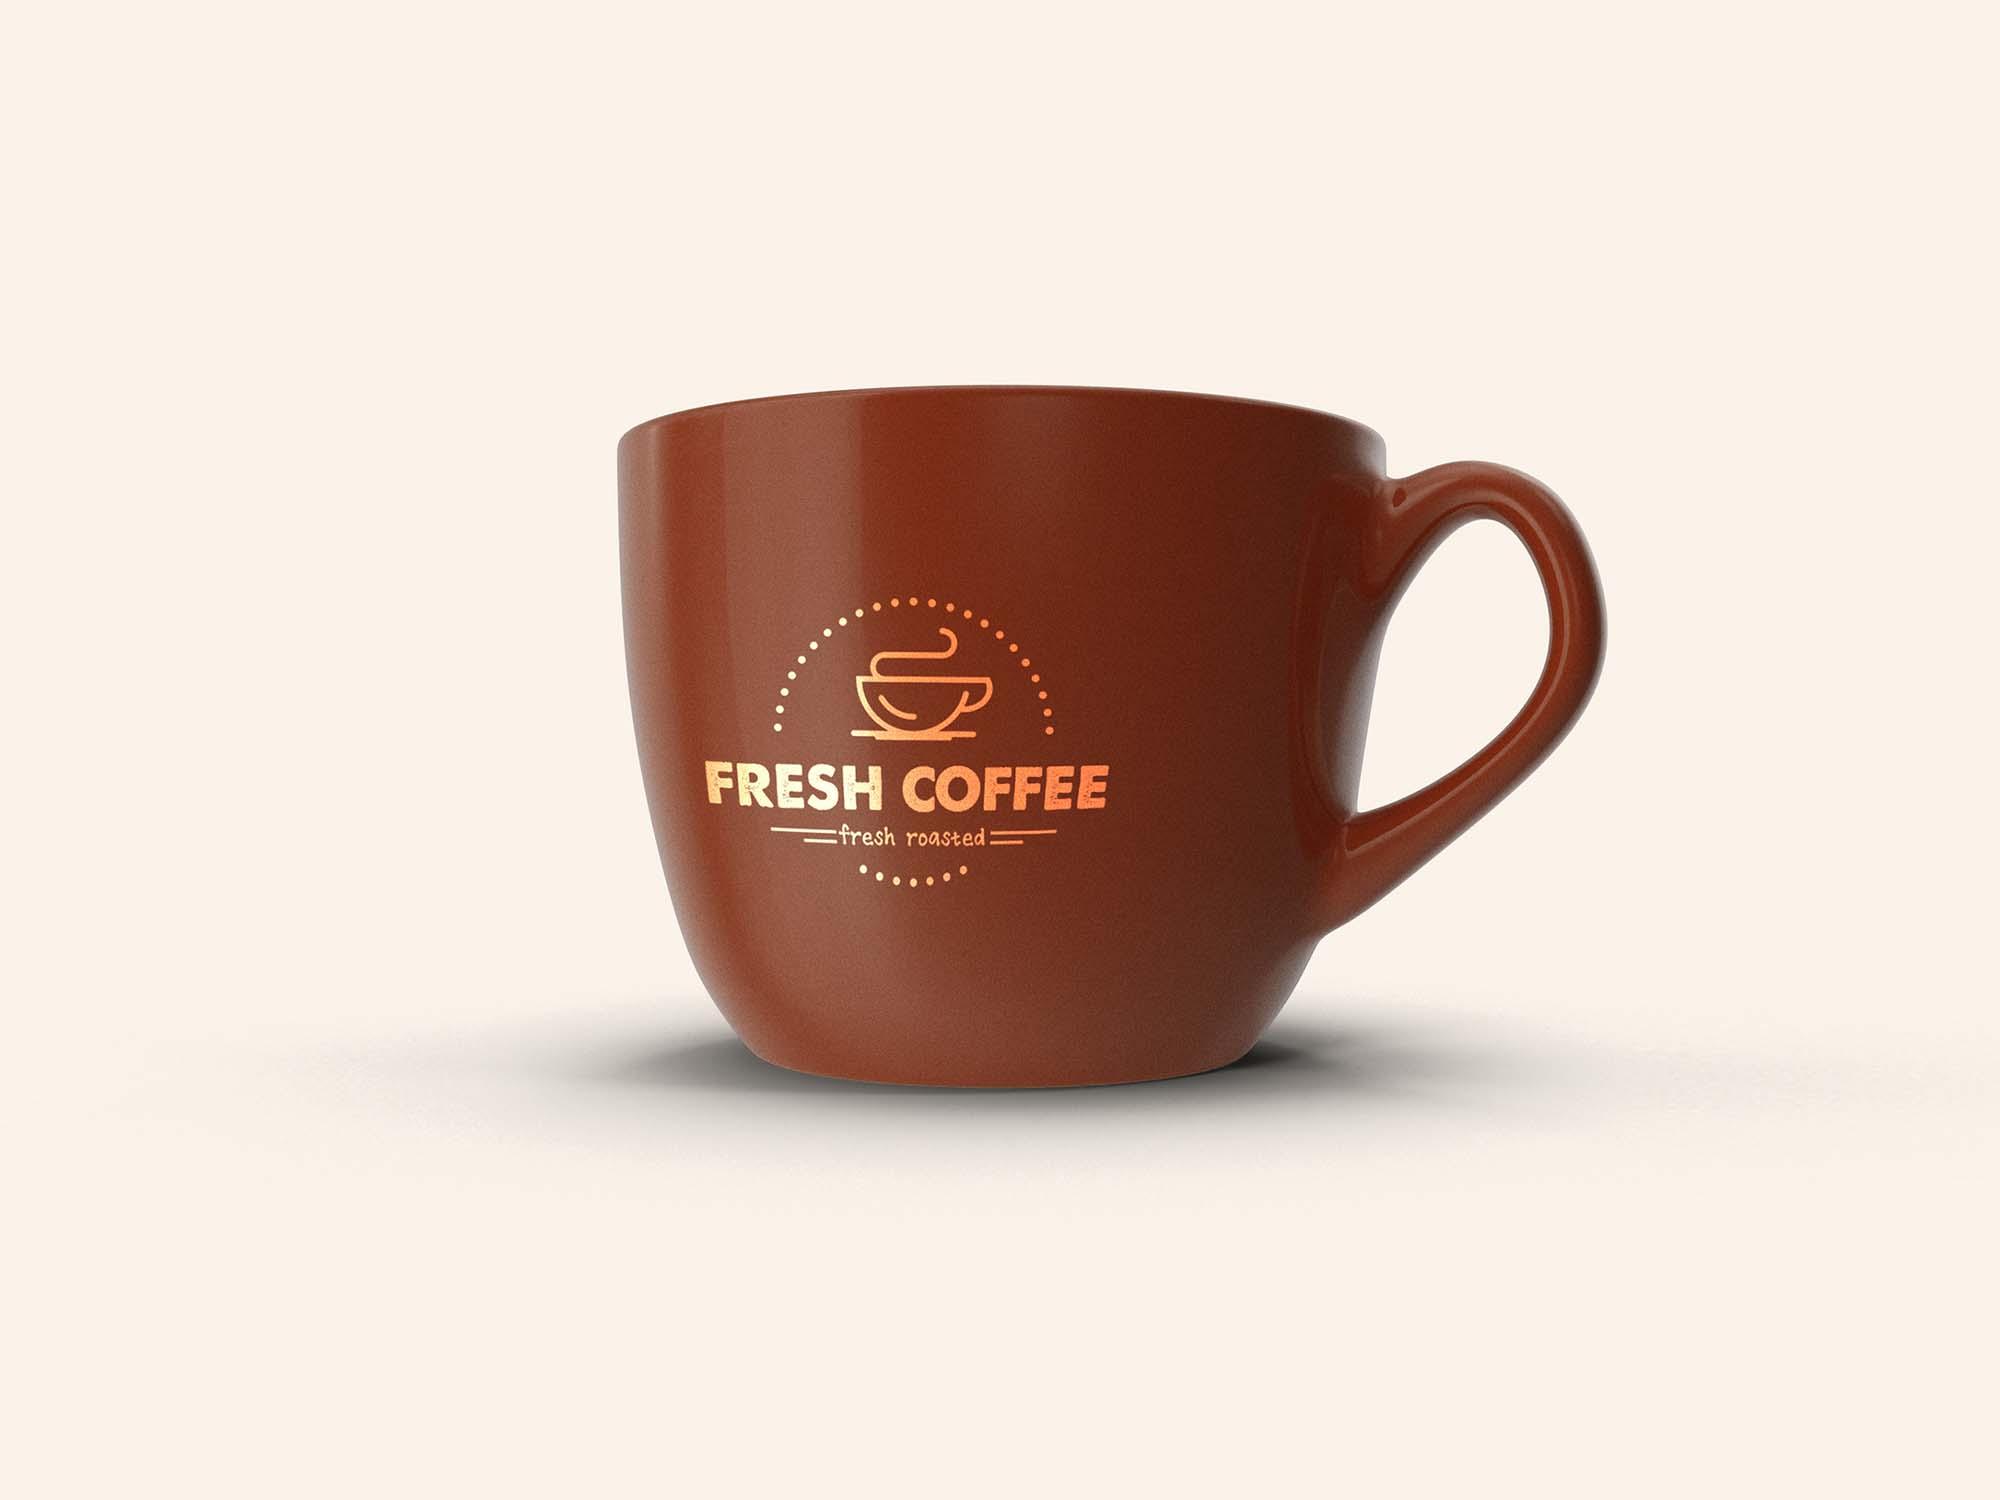 Ceramic Coffee Cup Mockup 2